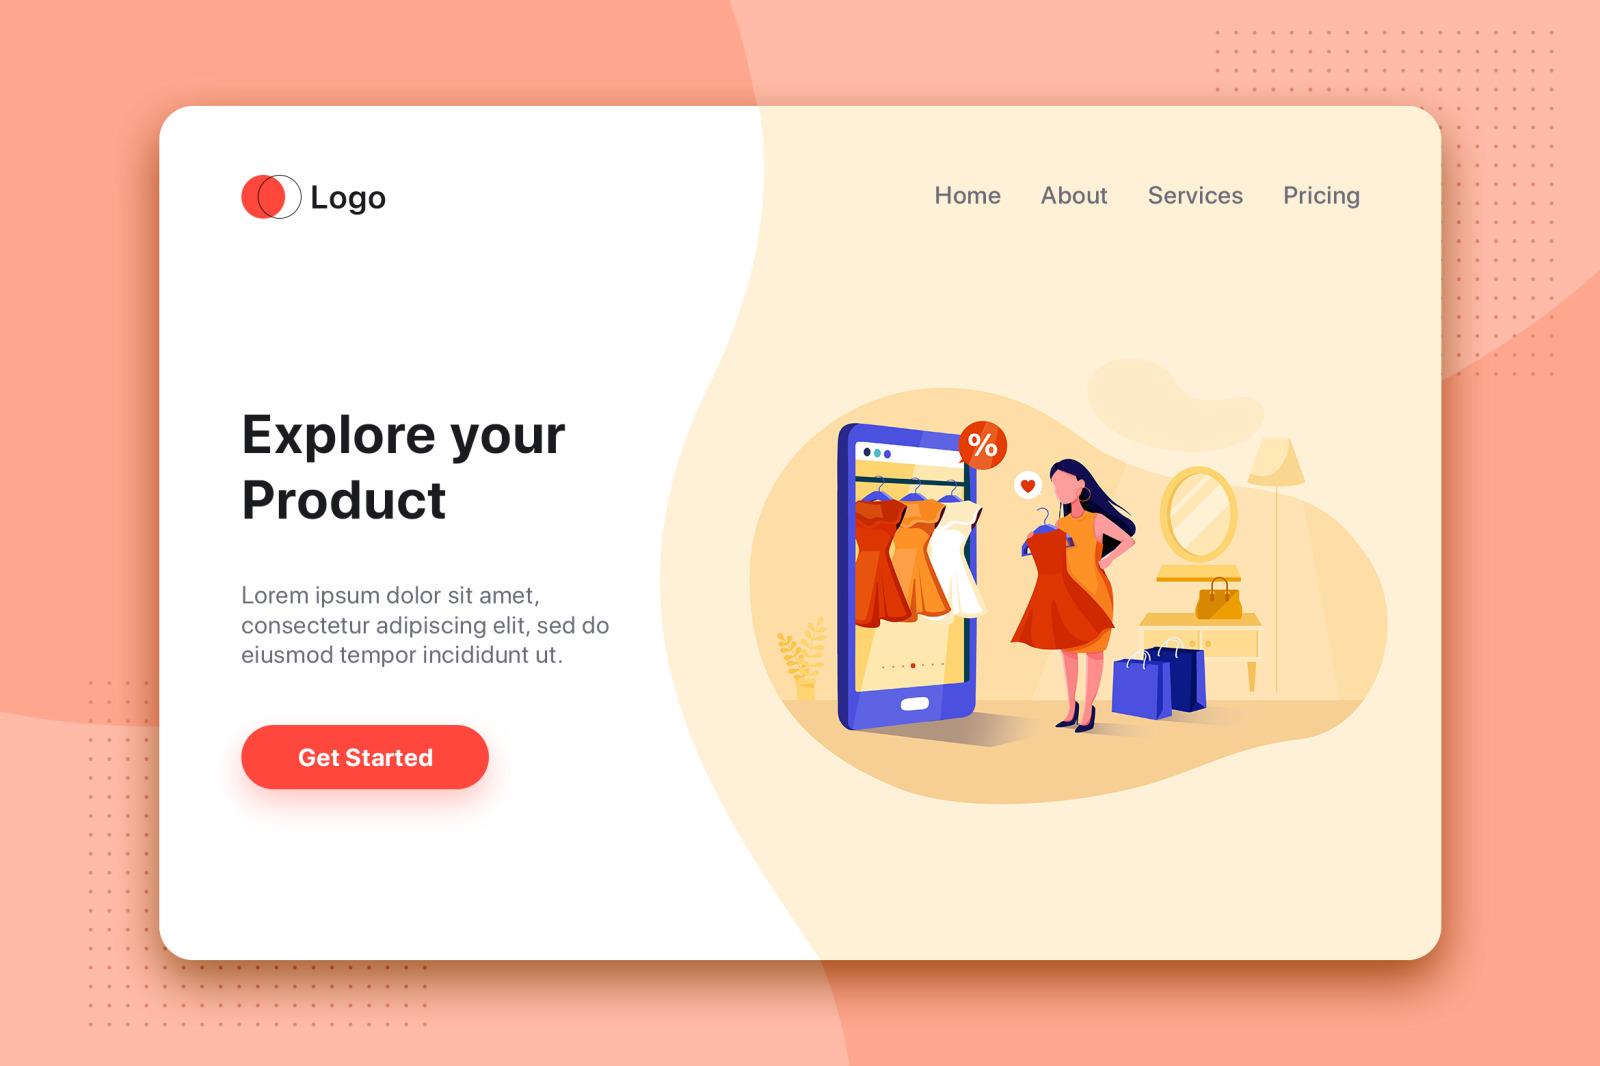 [Part 15] Website Illustrations Set